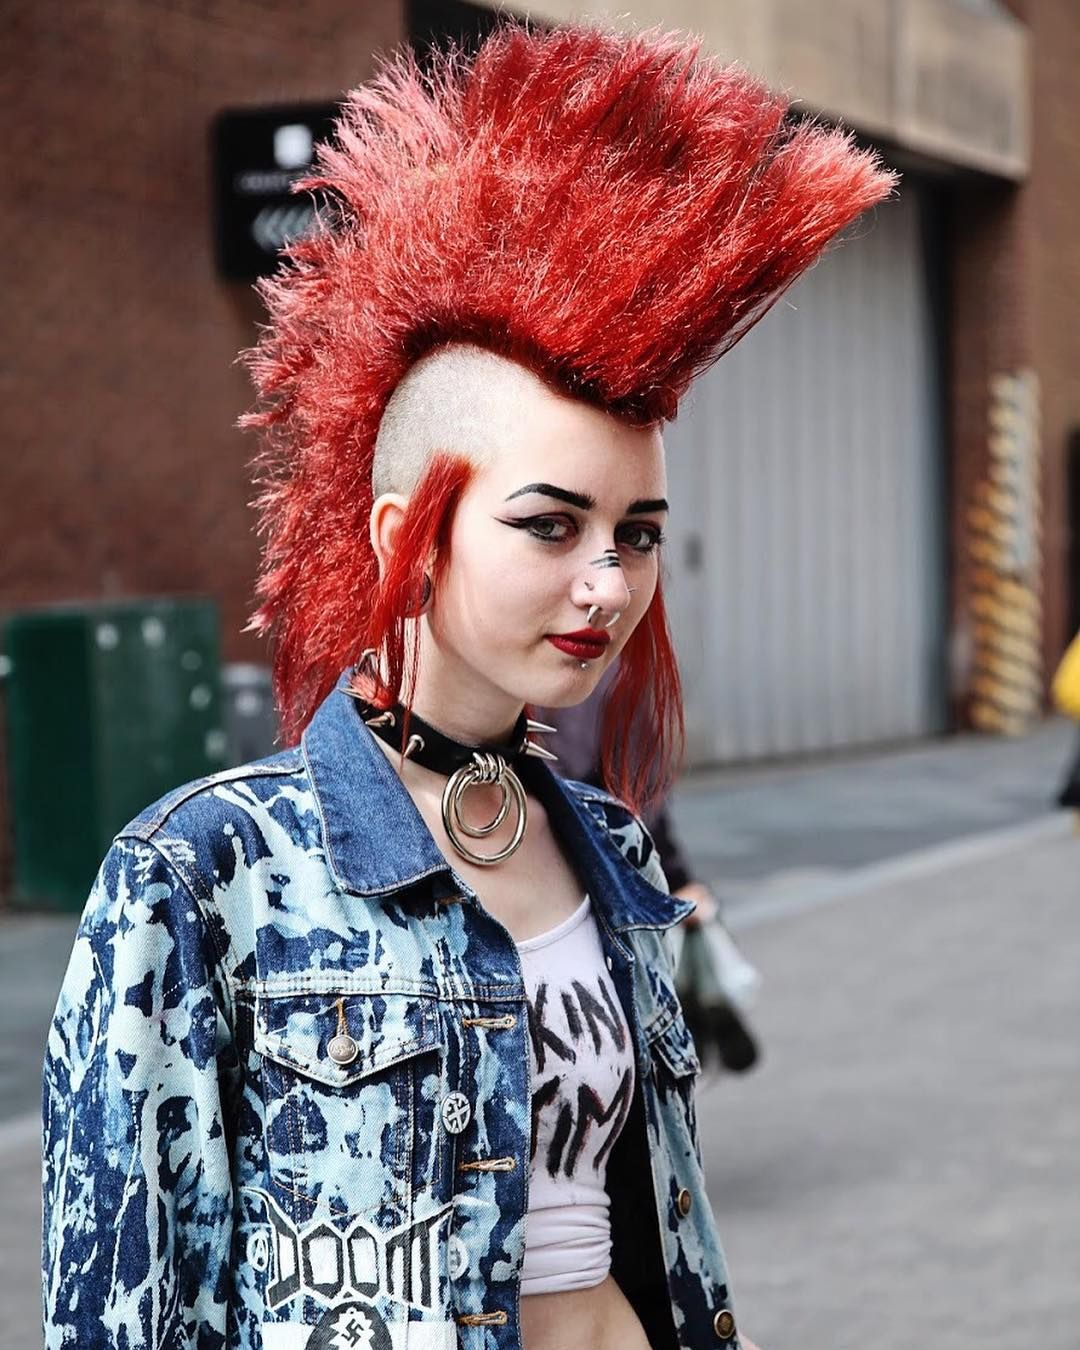 punk rock girl | punk in 2019 | punk rock girls, punk mohawk